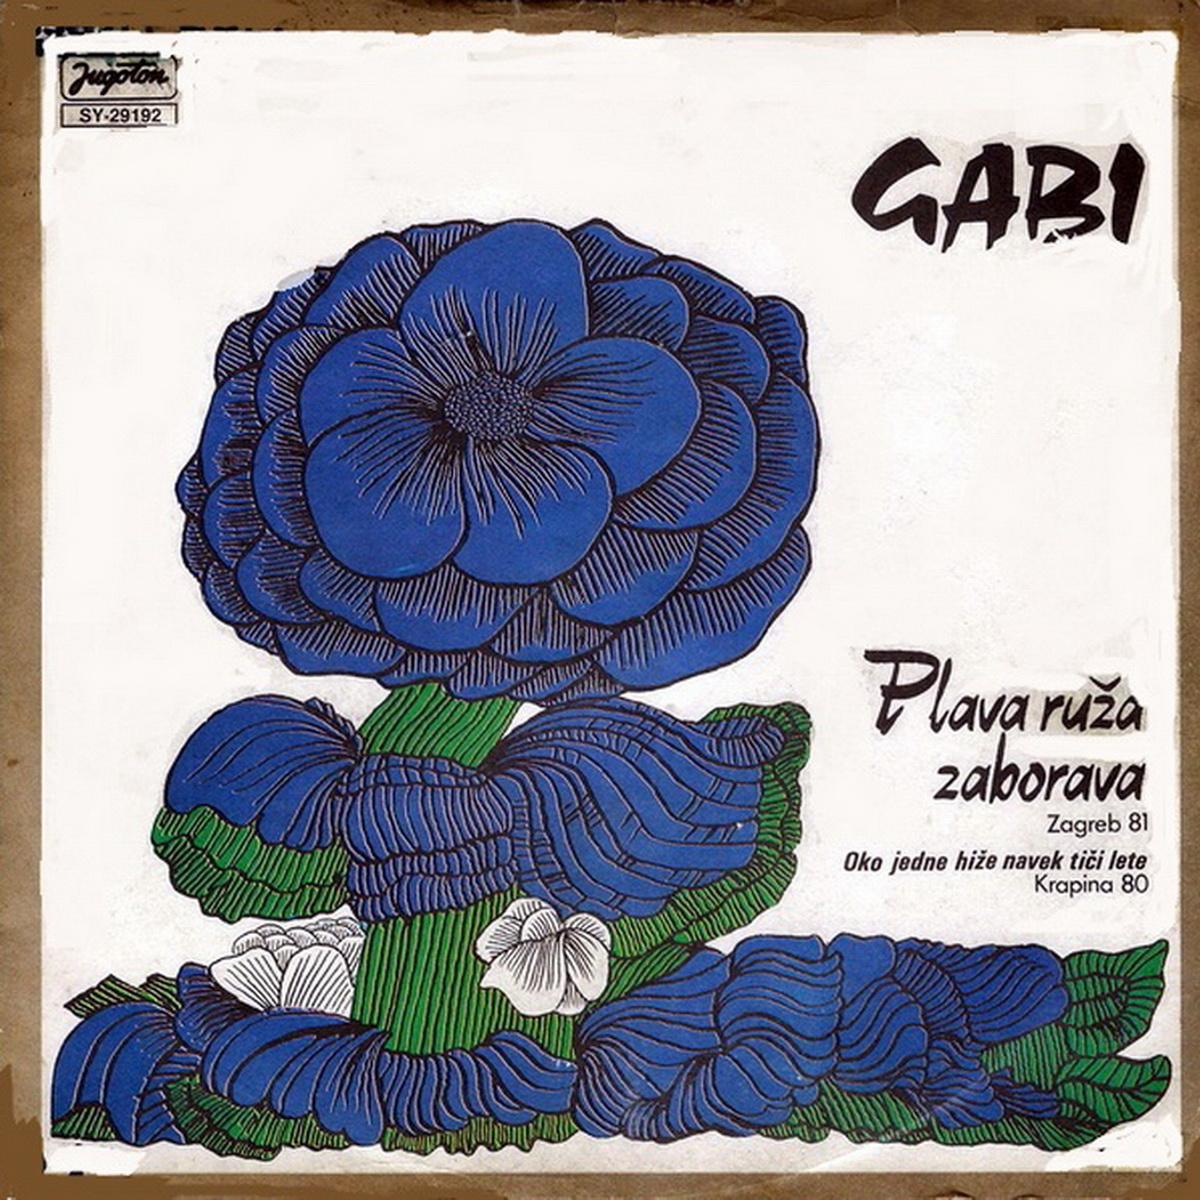 Gabi Novak 1981 Plava ruza zaborava B